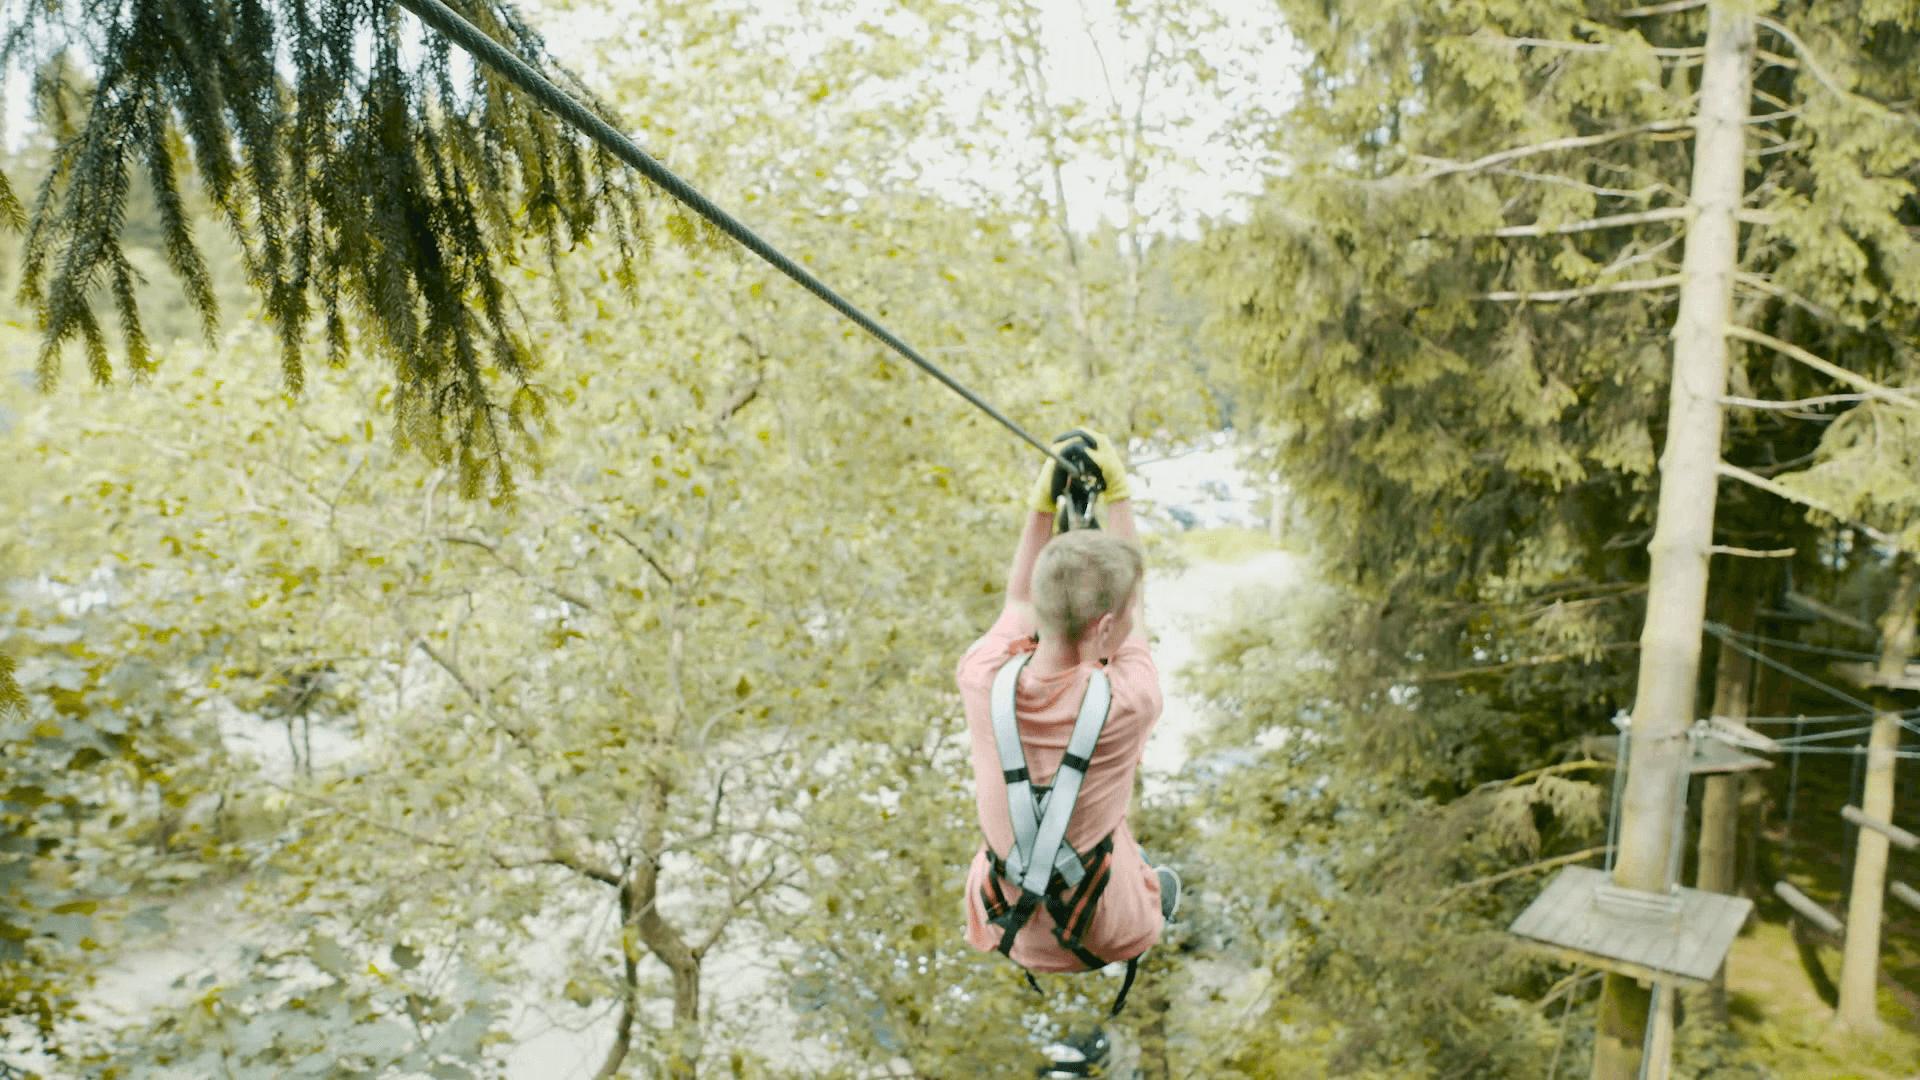 Kind fährt Seilbahn im Kletterwald Winterberg am Erlebnisberg Kappe